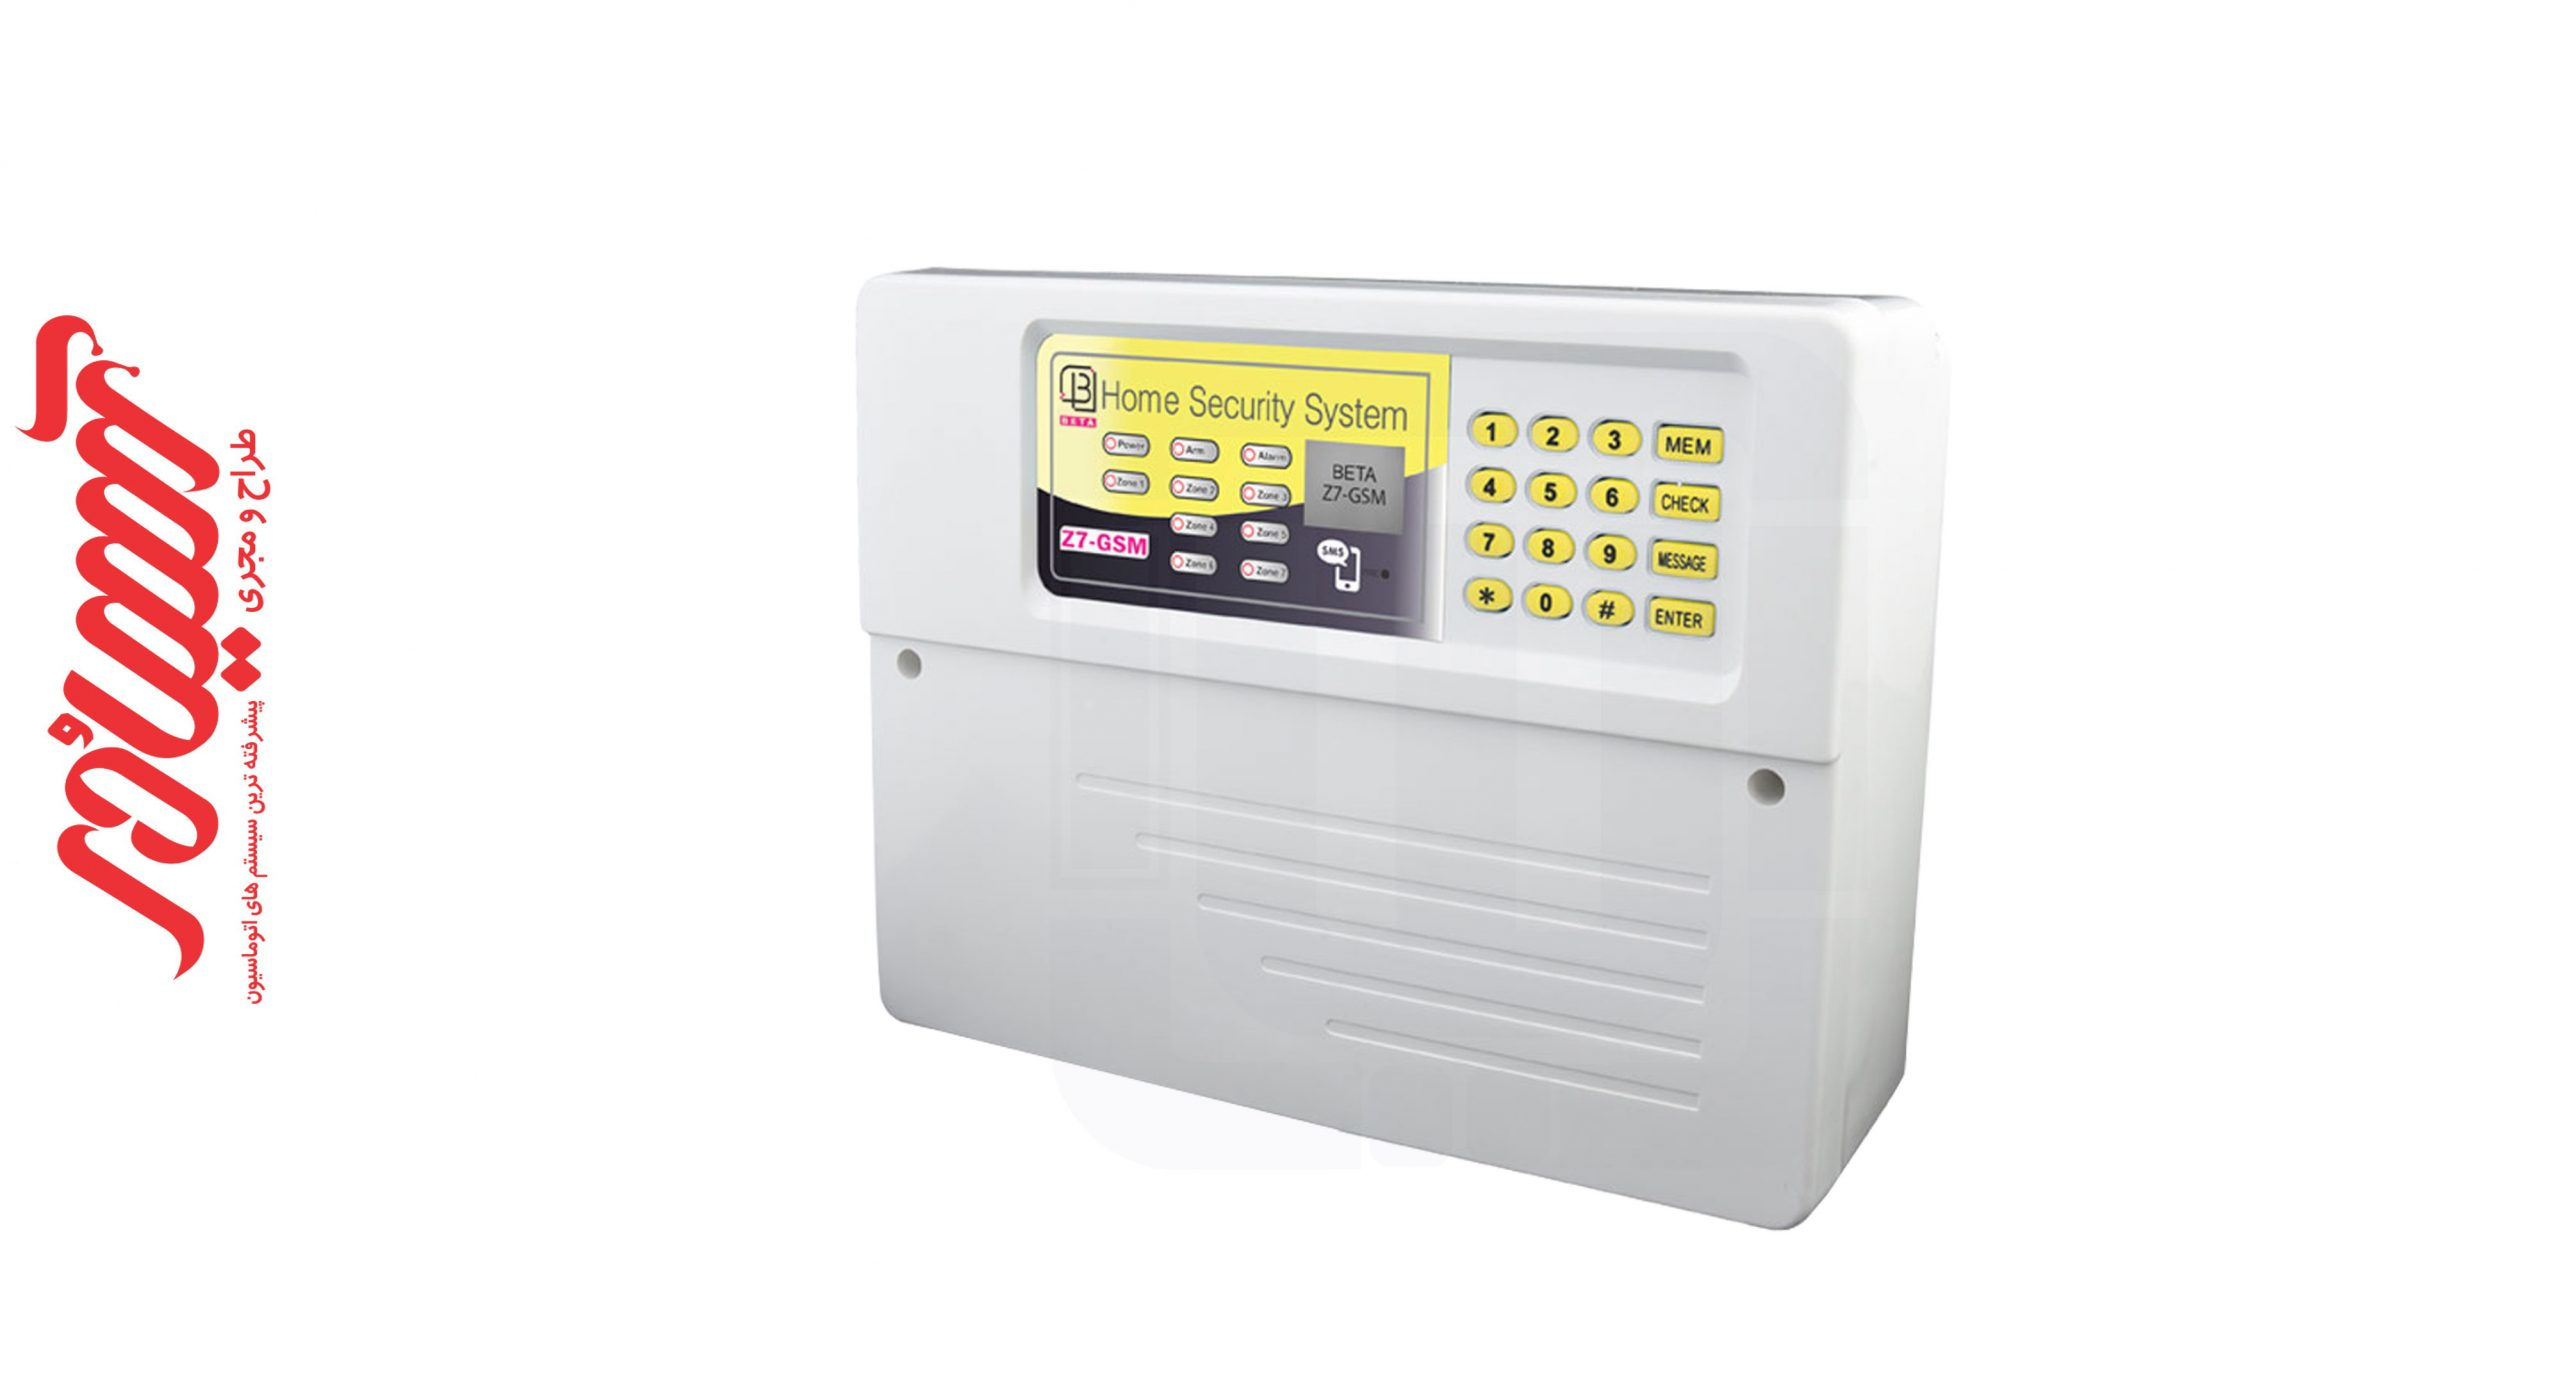 Beta Z7-GSM